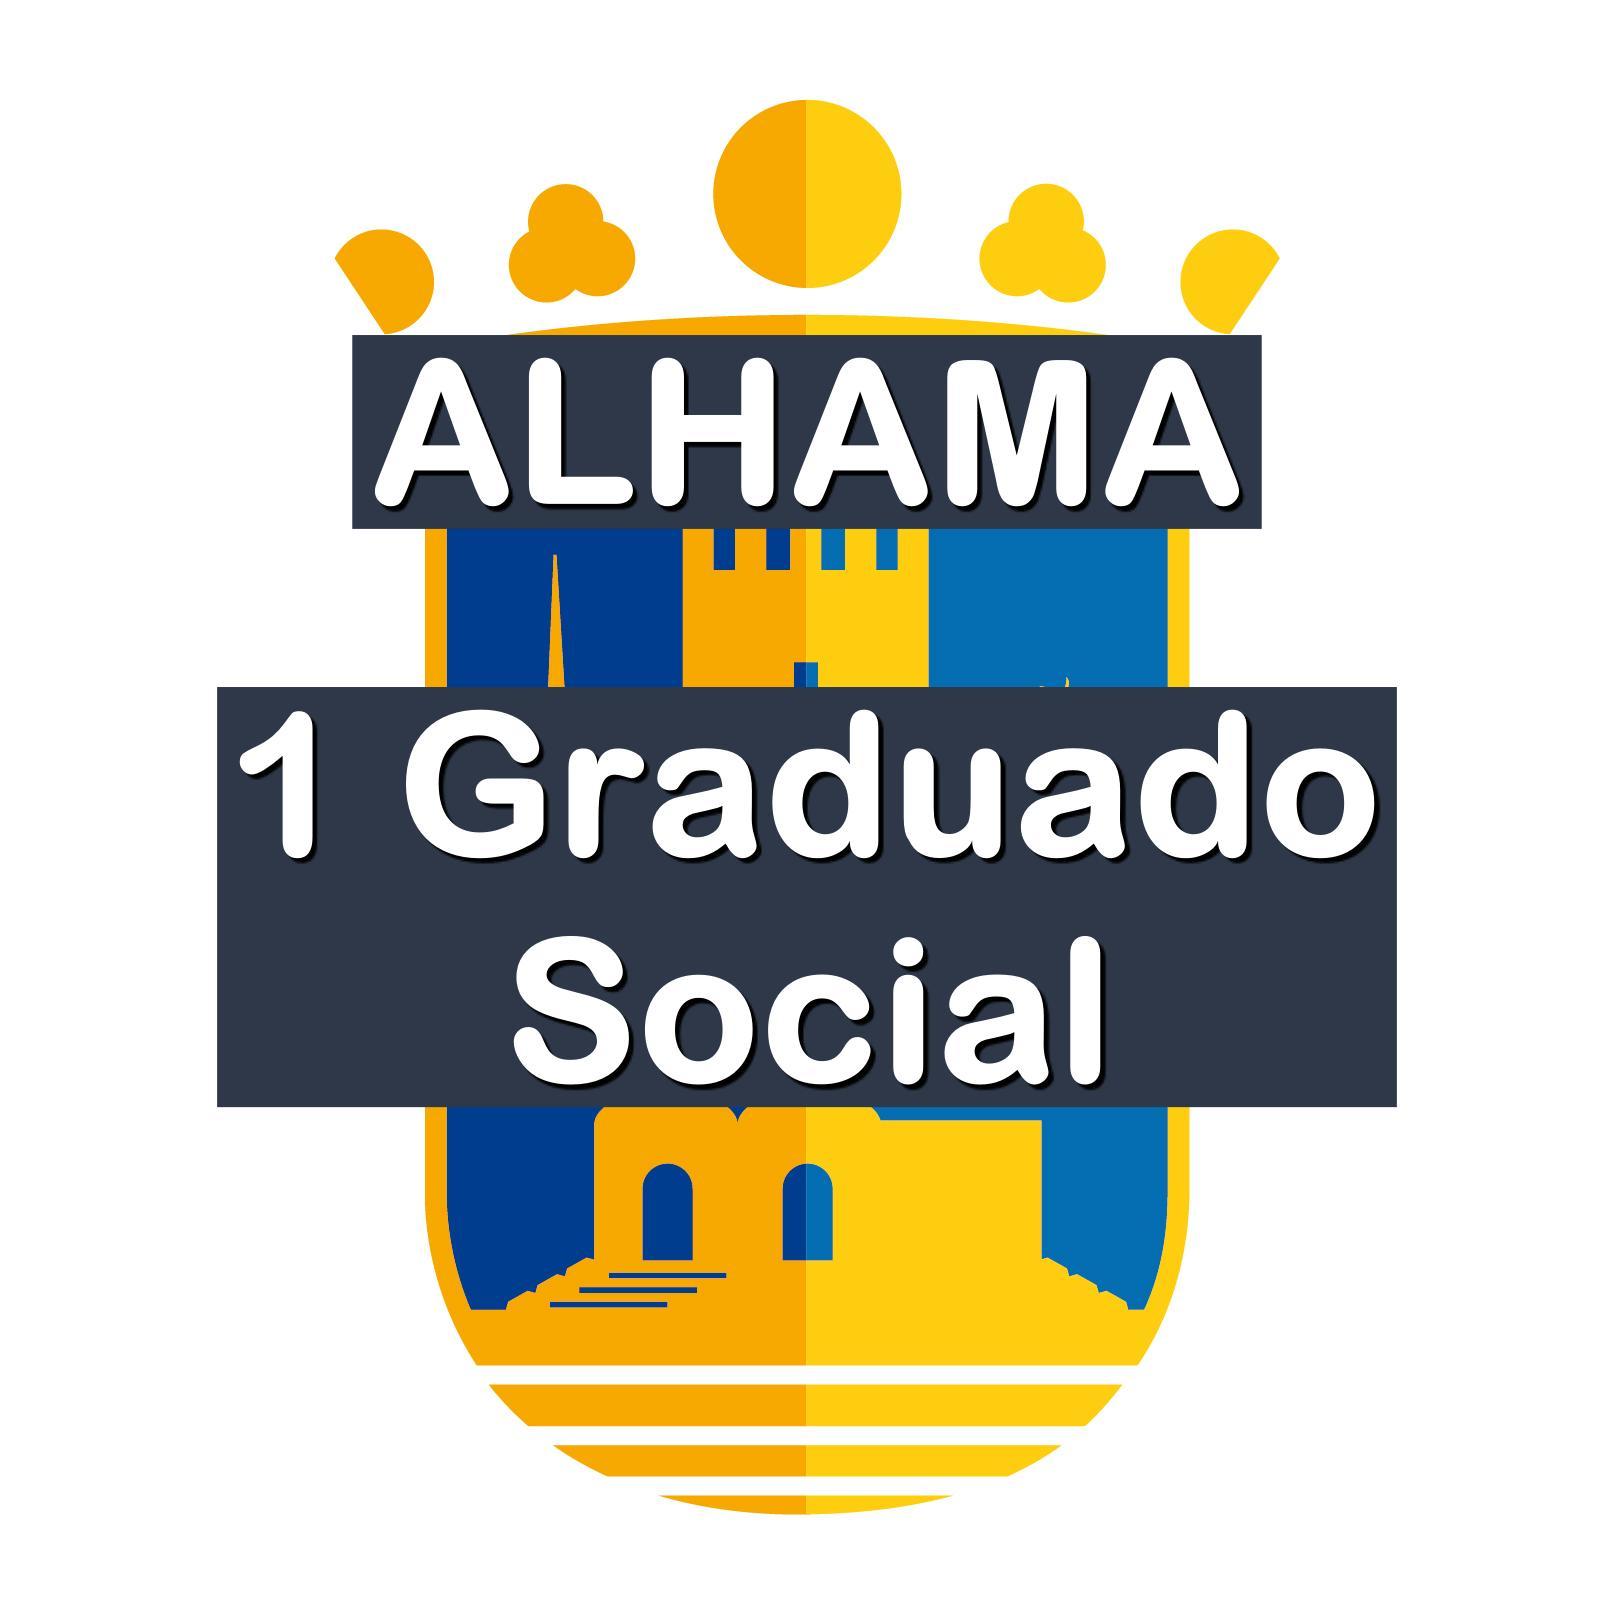 1 Graduado Social en Alhama de Murcia